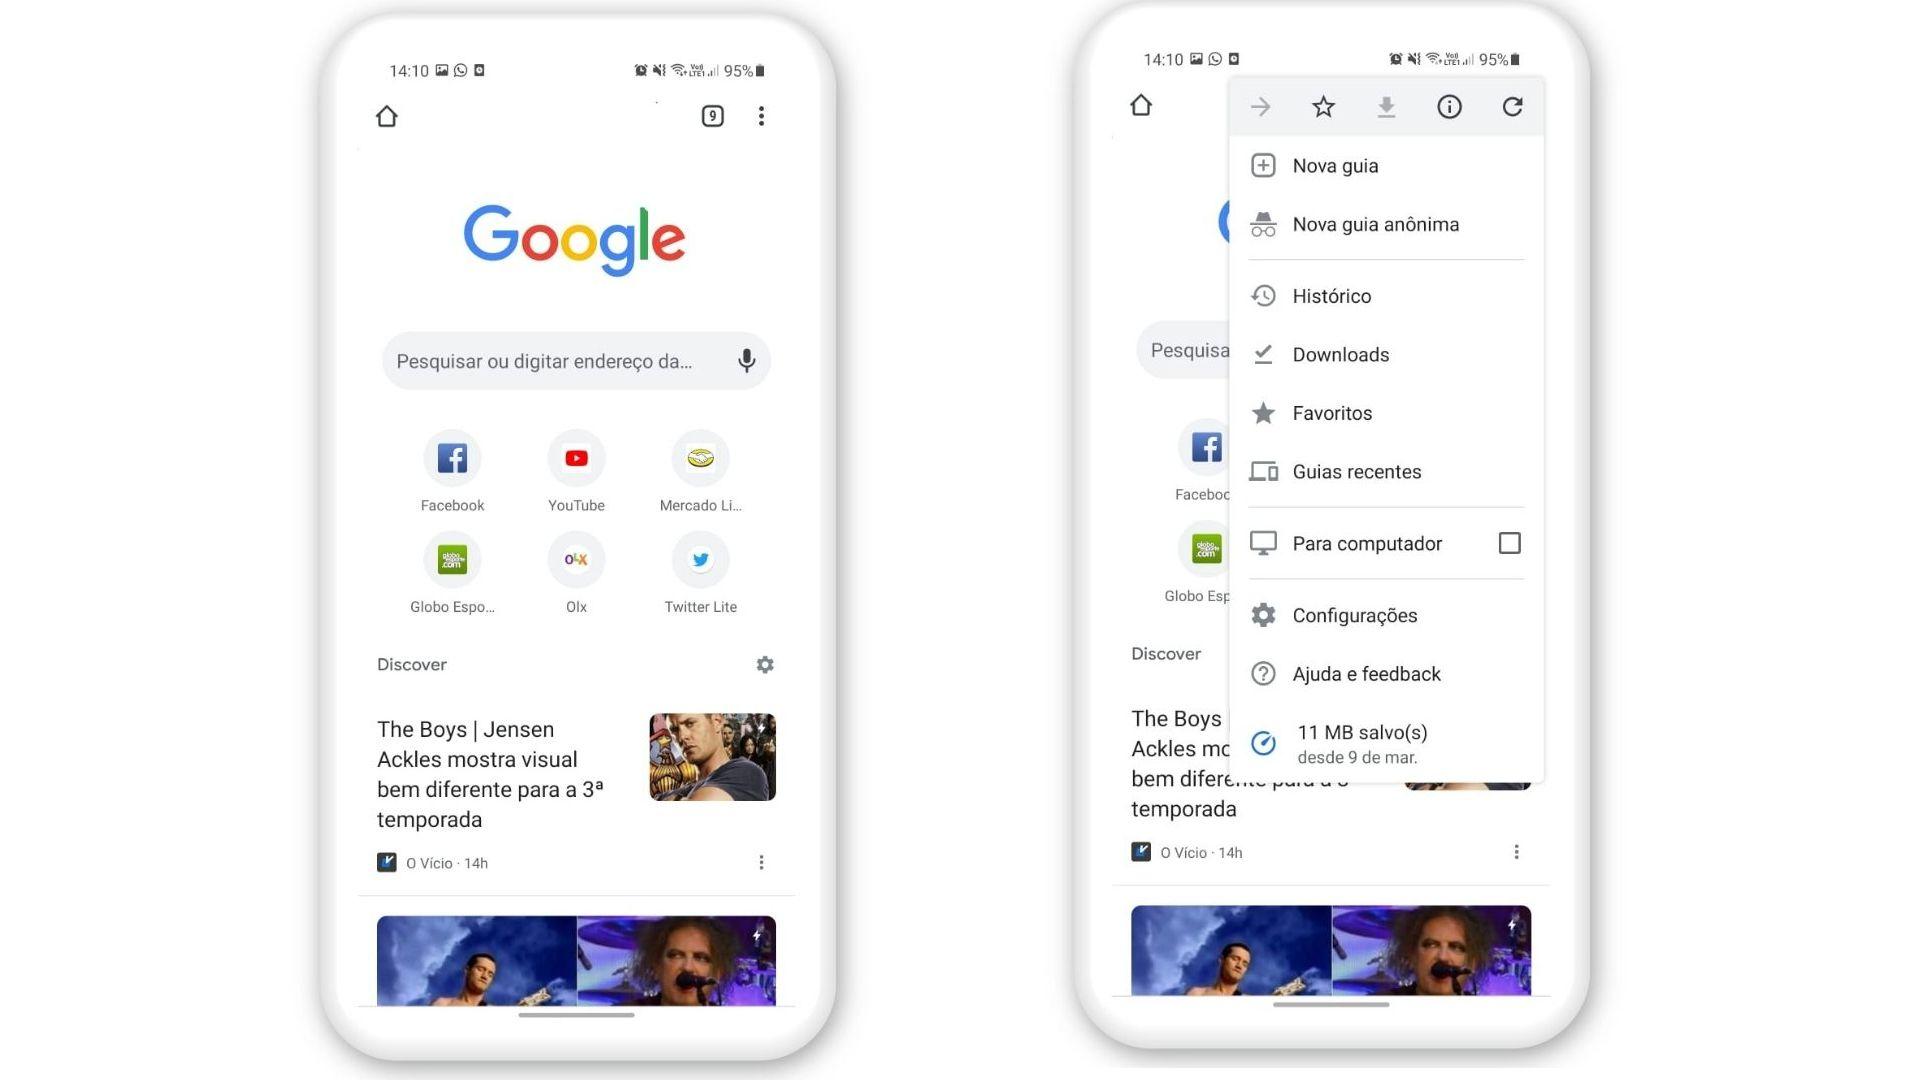 Print de tela mostrando como colocar o Google no modo escuro no Android